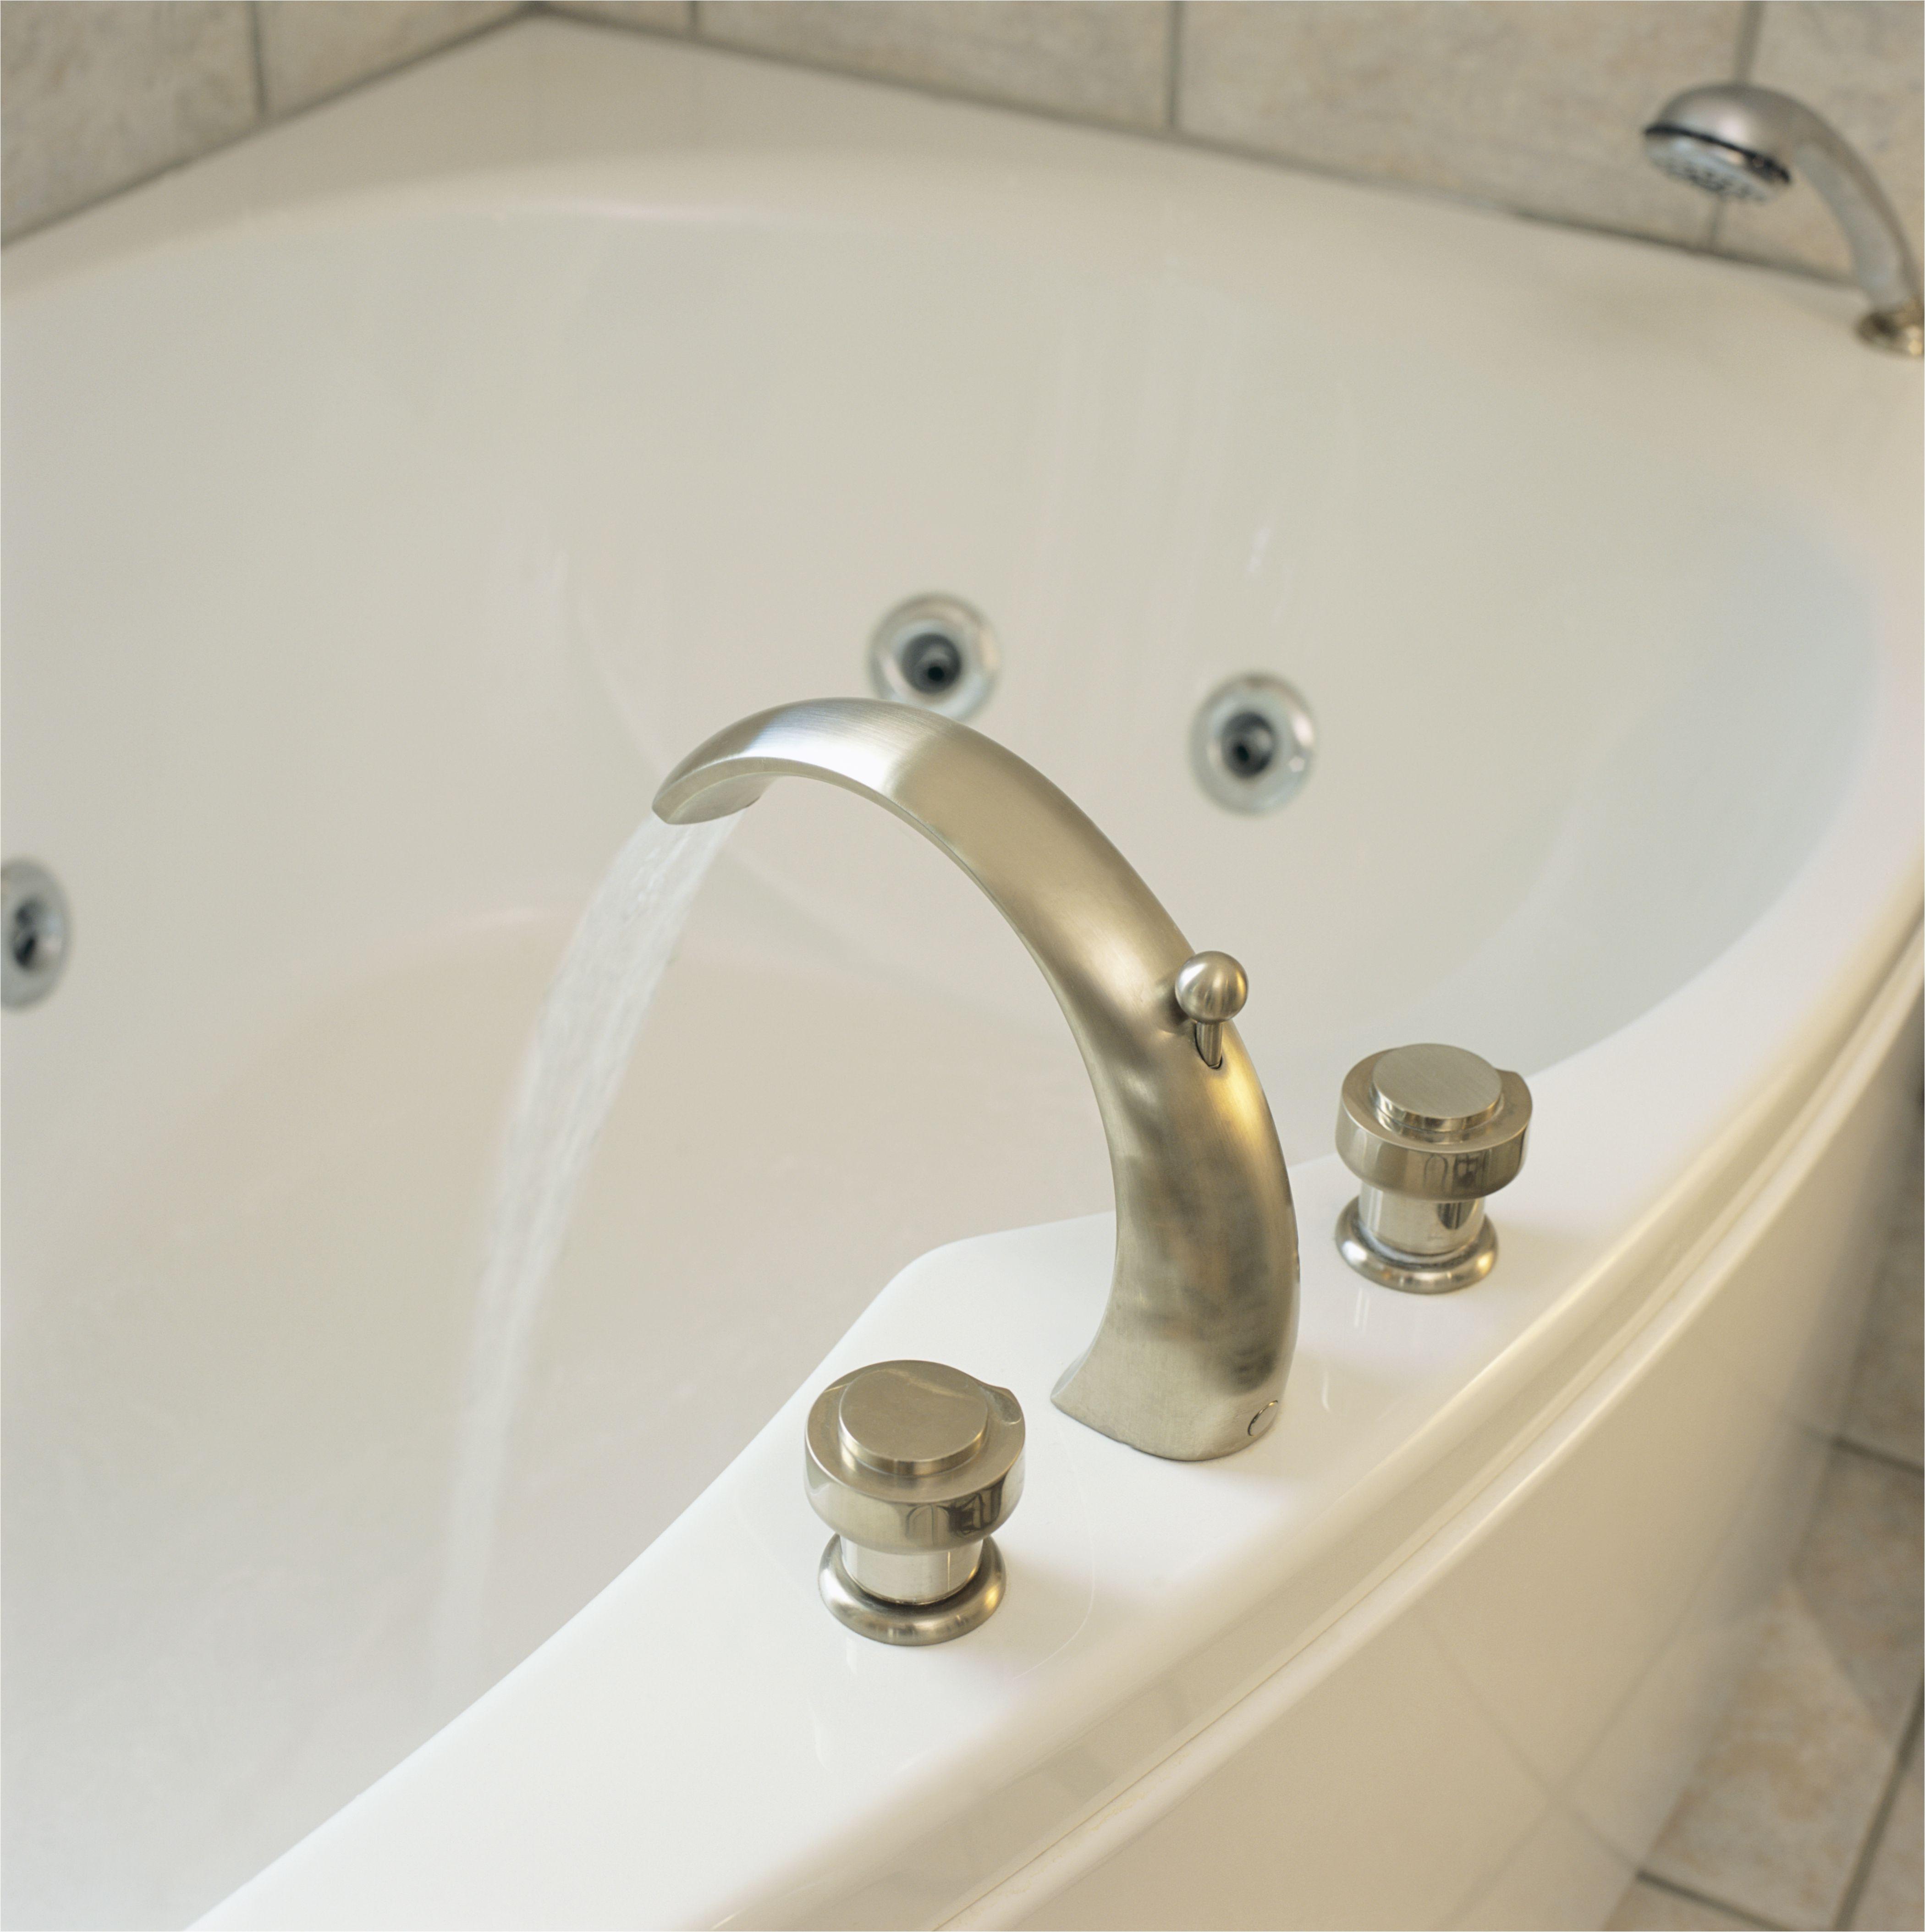 bathtub with water running 523148742 5797d4a93df78ceb86a48b66